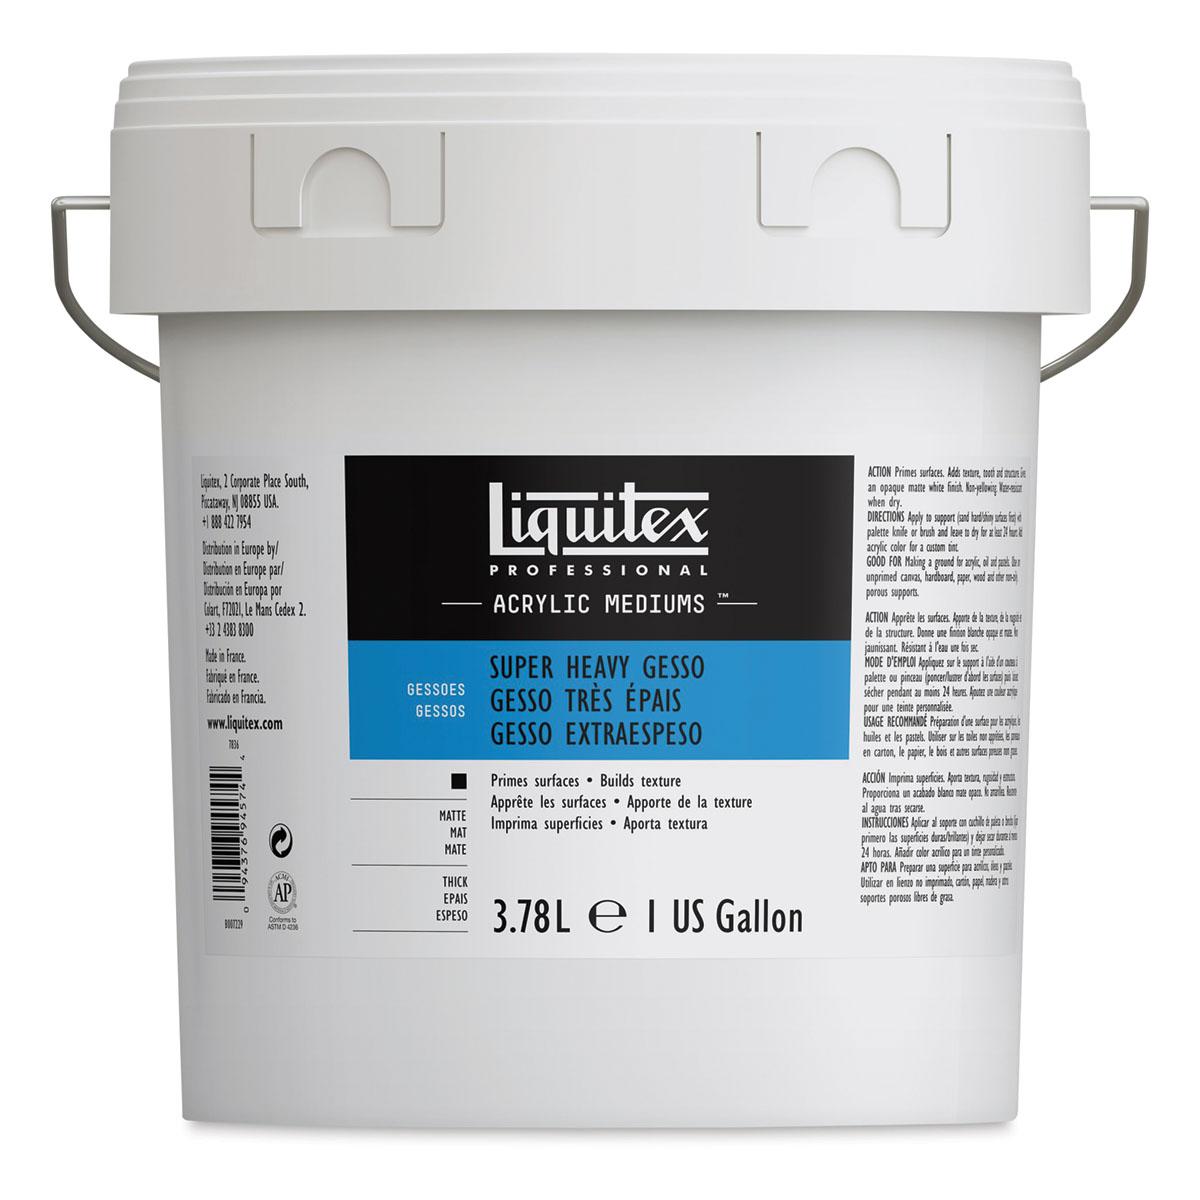 Liquitex Super Heavy Acrylic Gesso - Gallon